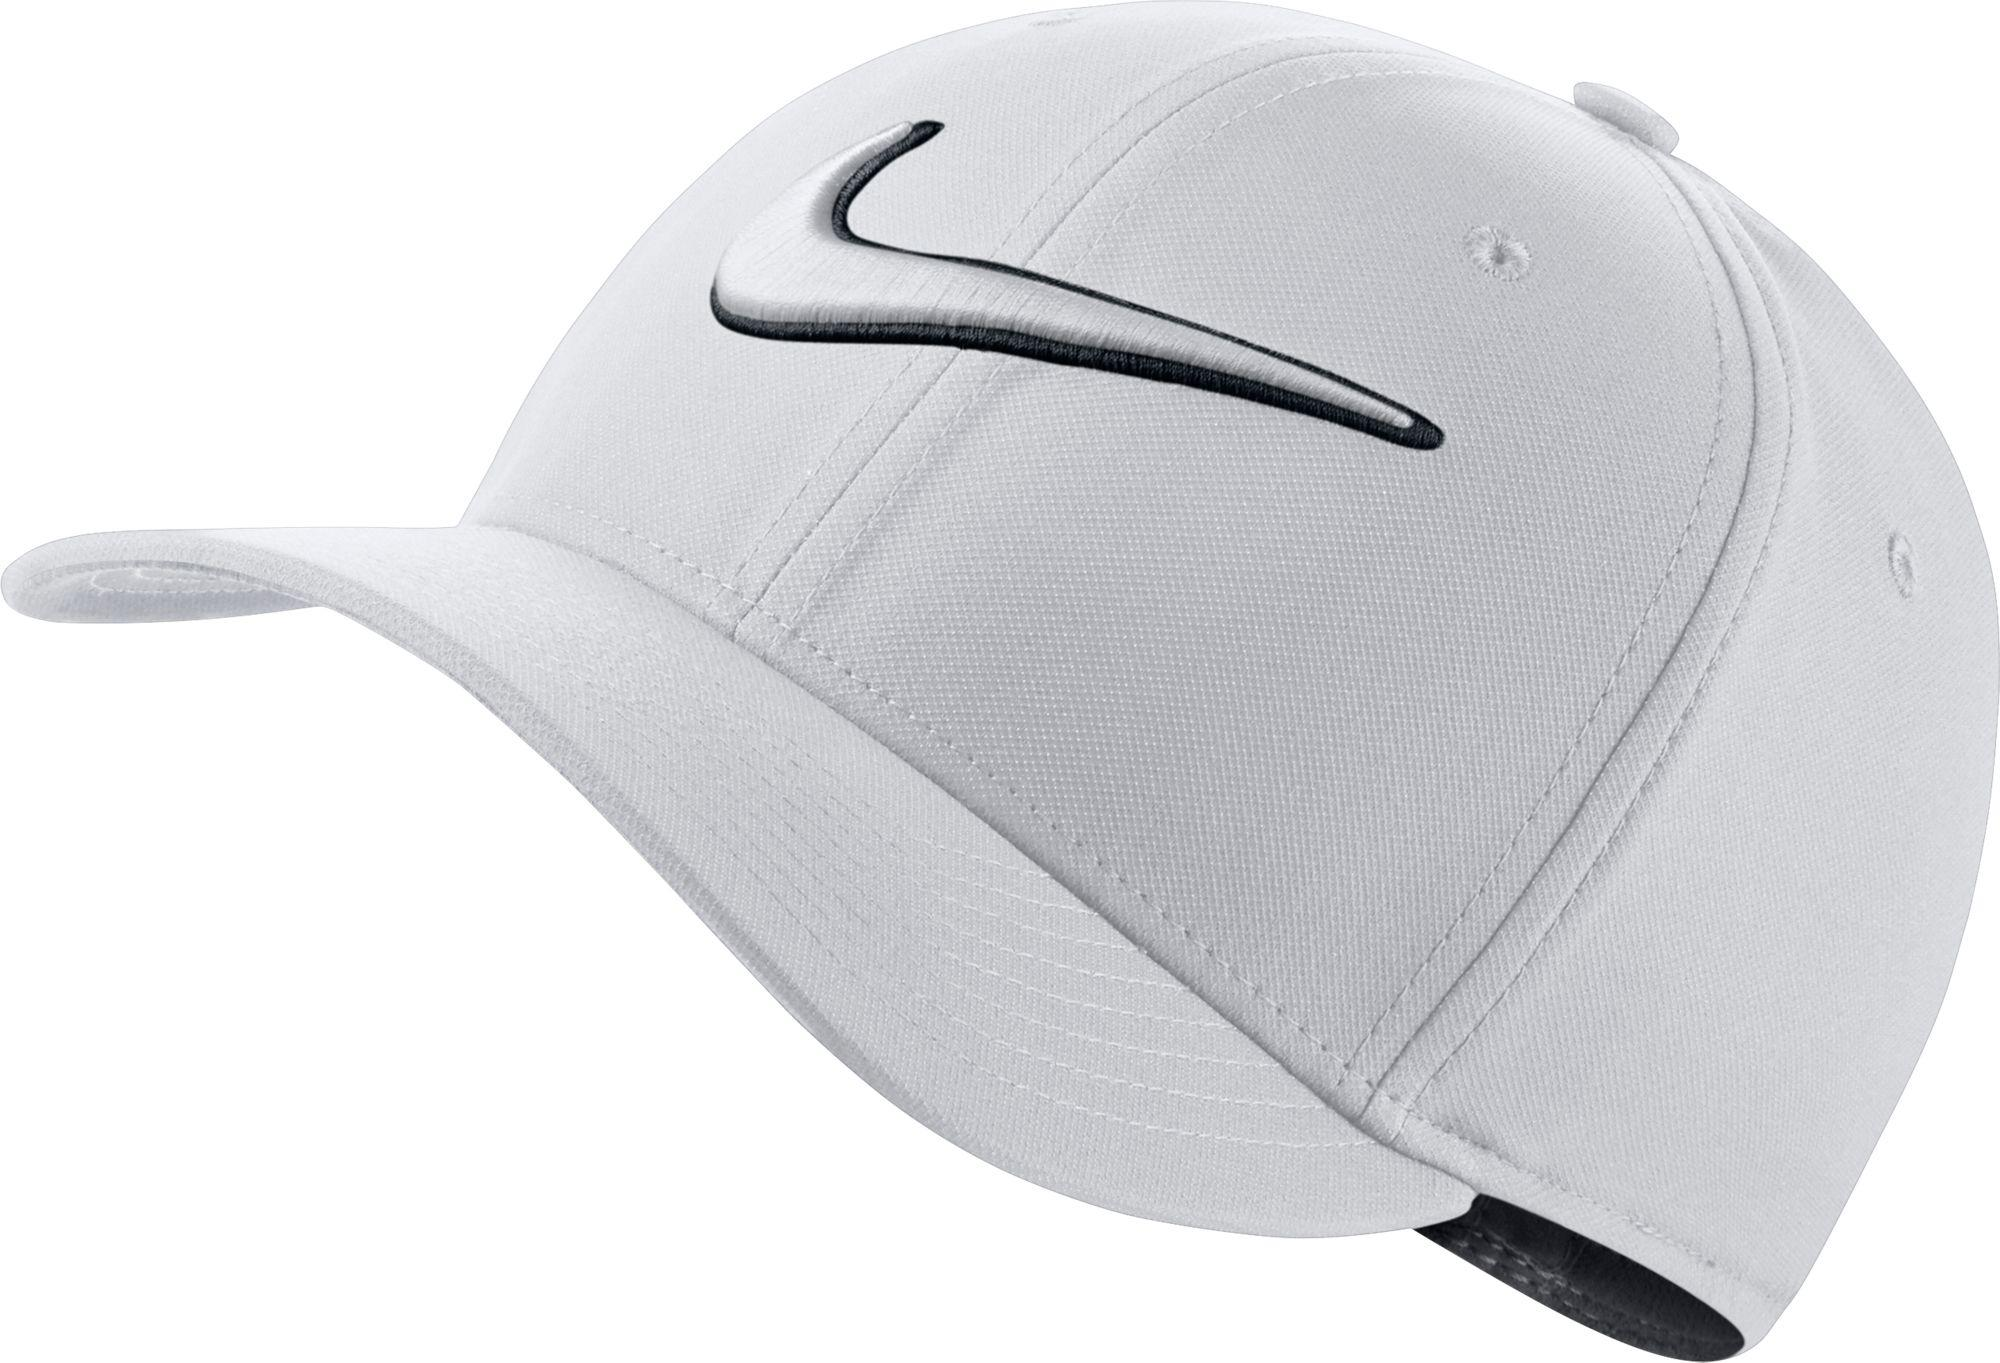 72cefbaa2cd Lyst - Nike Classic99 Swoosh Golf Hat in White for Men